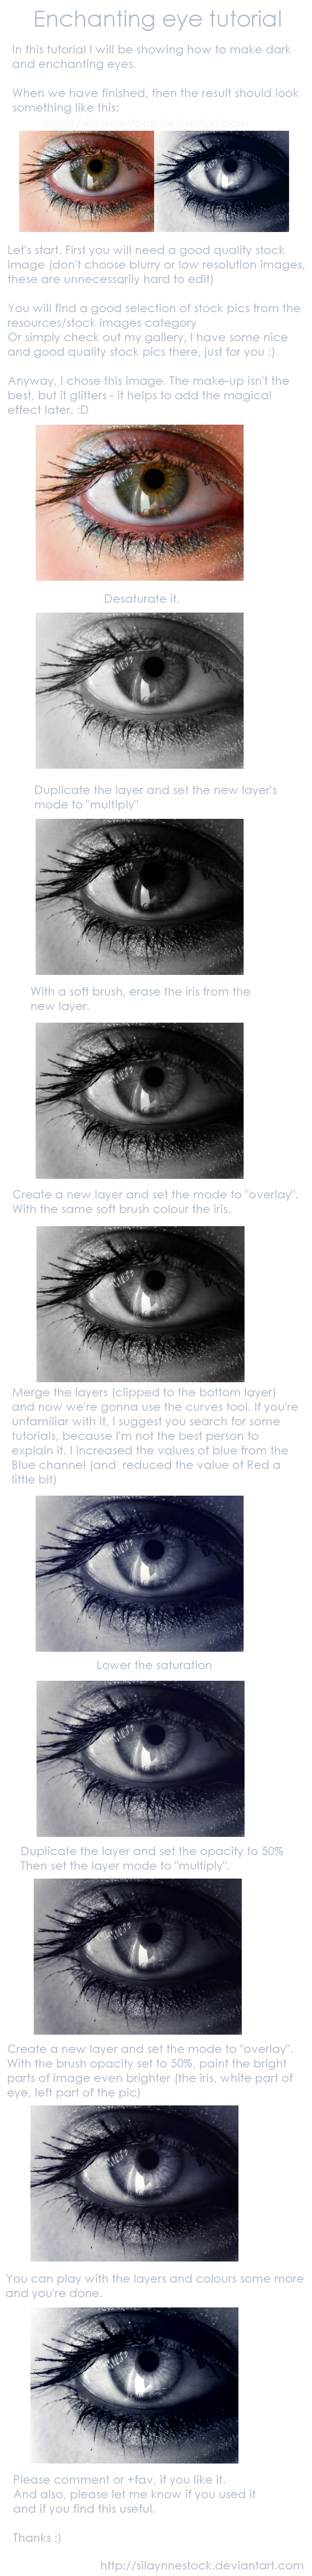 Enchanting eye: tutorial by SilaynneStock